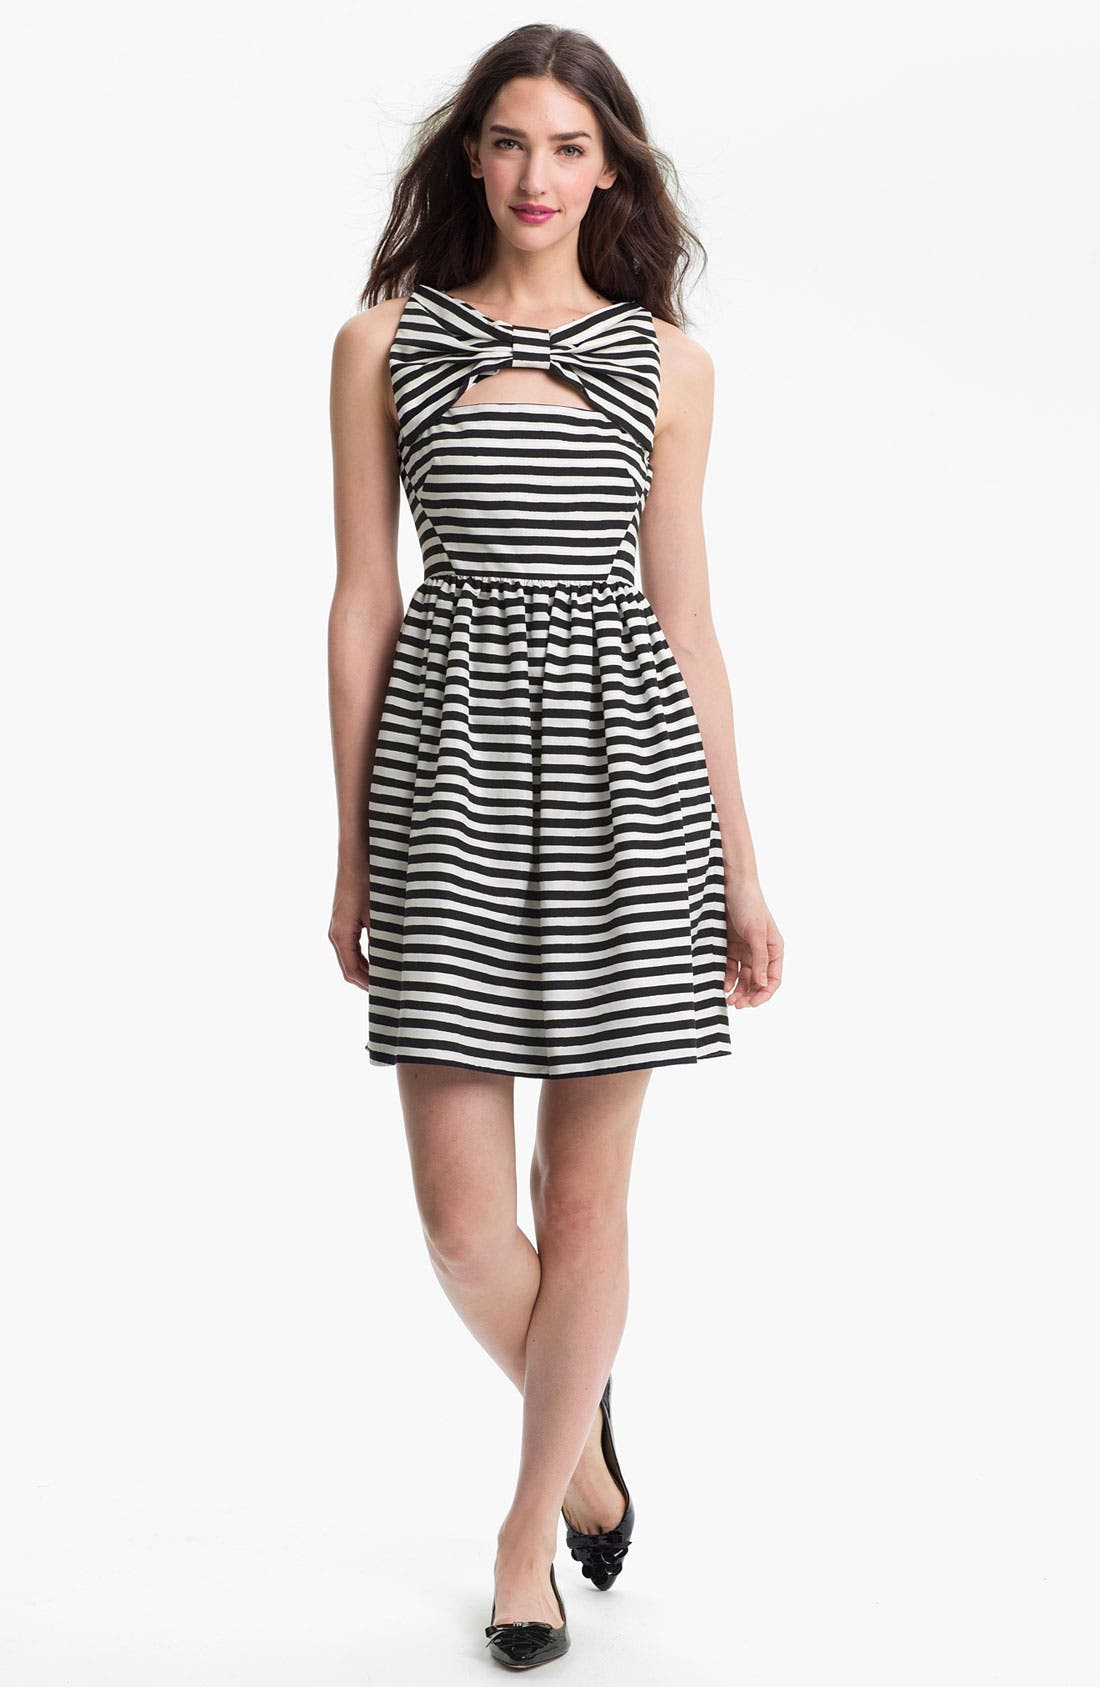 Alternate Image 1 Selected - kate spade new york 'vivien' stripe fit & flare dress